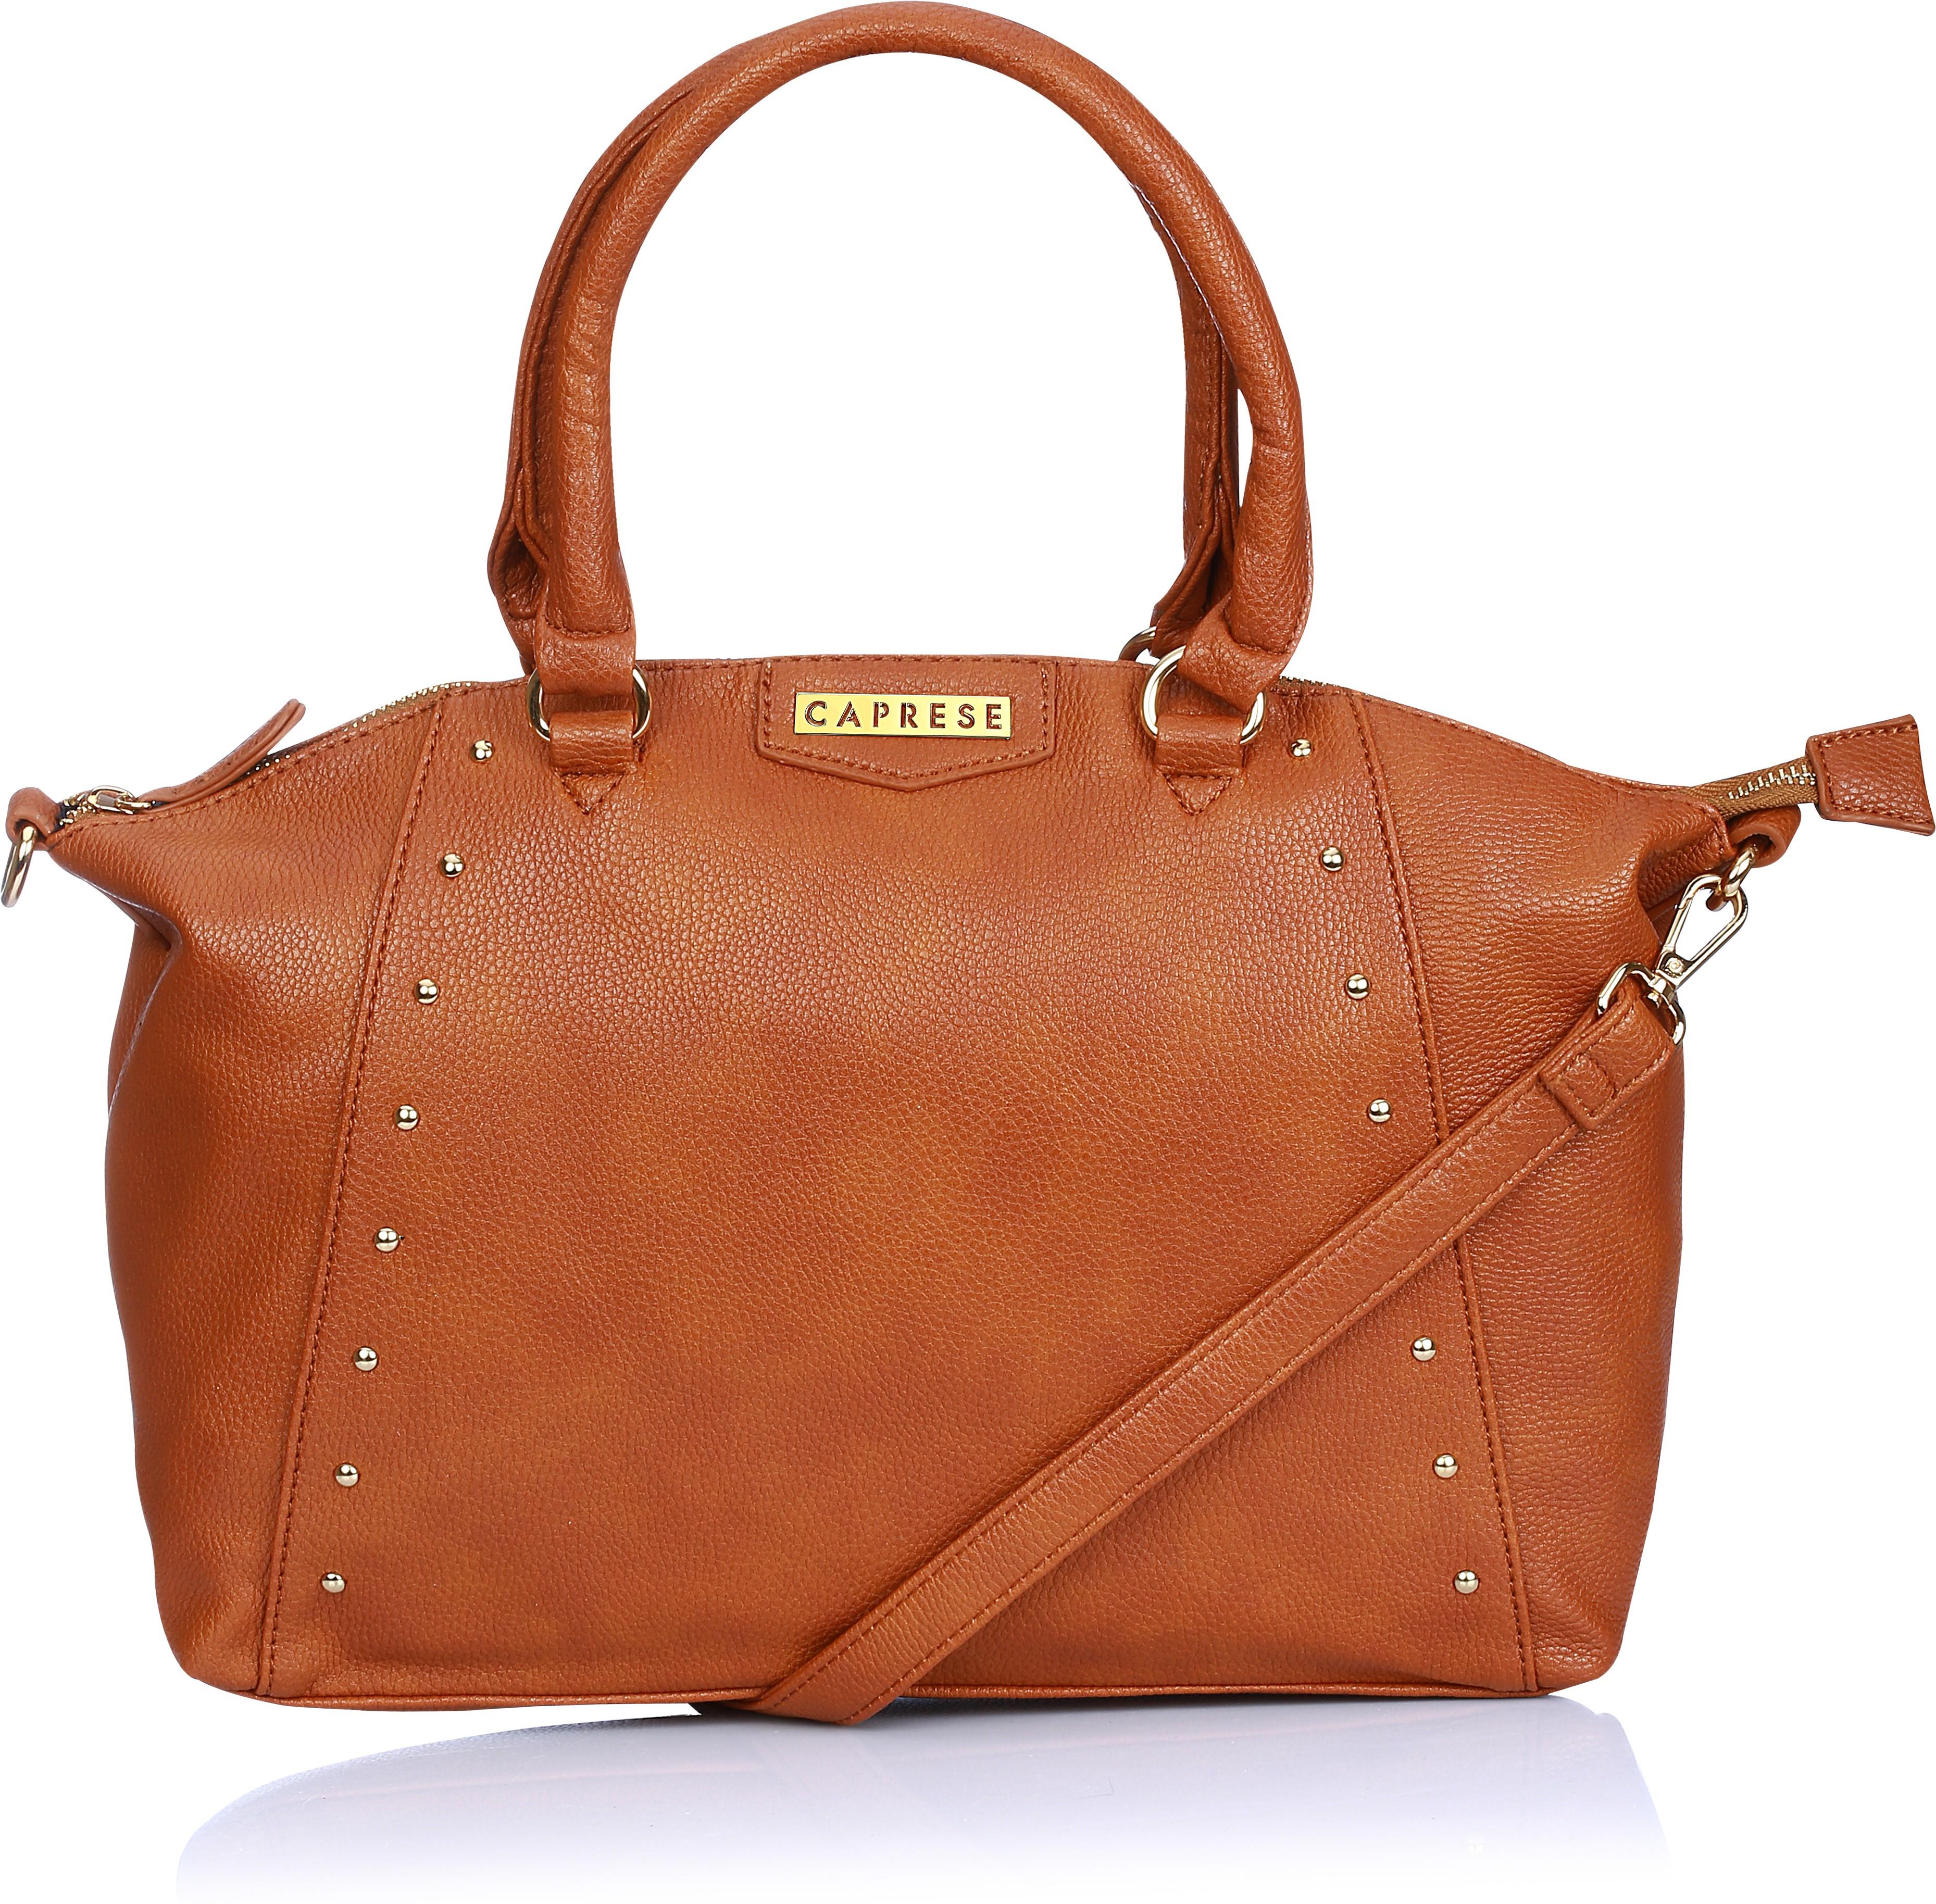 Deals - Raipur - Caprese, Fossil... <br> Top Brands<br> Category - bags_wallets_belts<br> Business - Flipkart.com